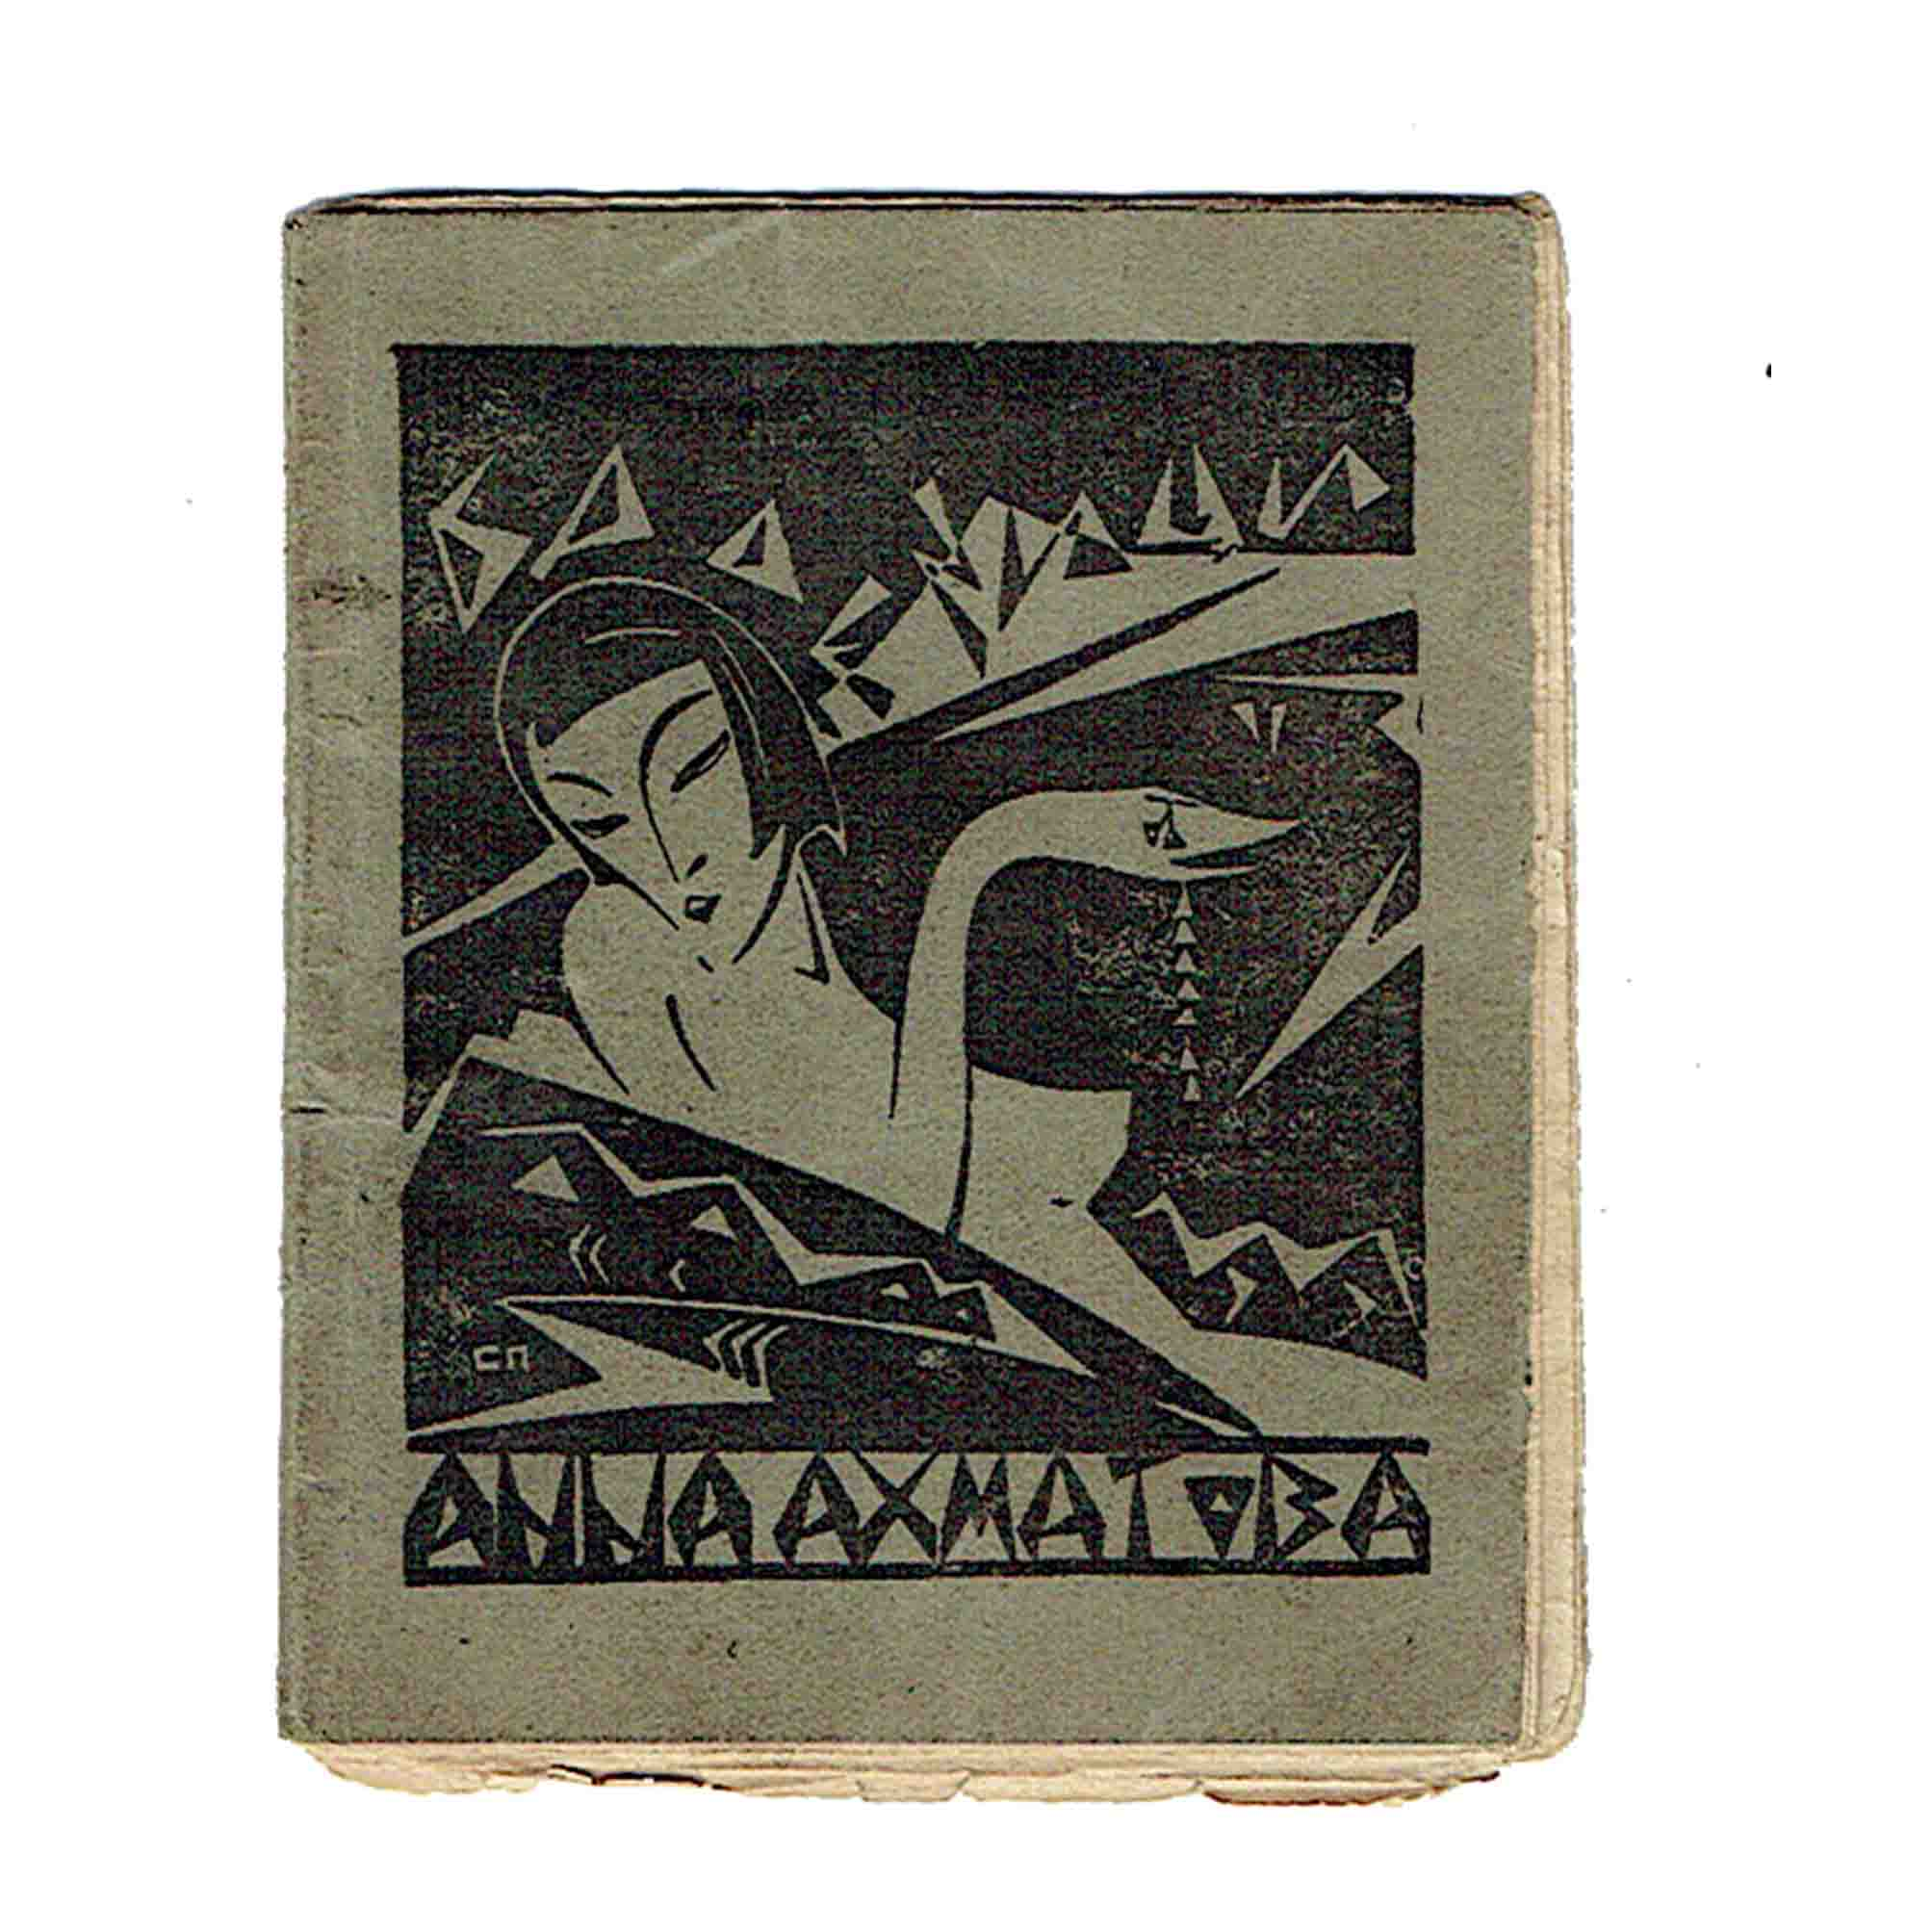 5853-Akhmatova-Peichev-Broenici-Bulgarisch-1923-frei-N.jpeg